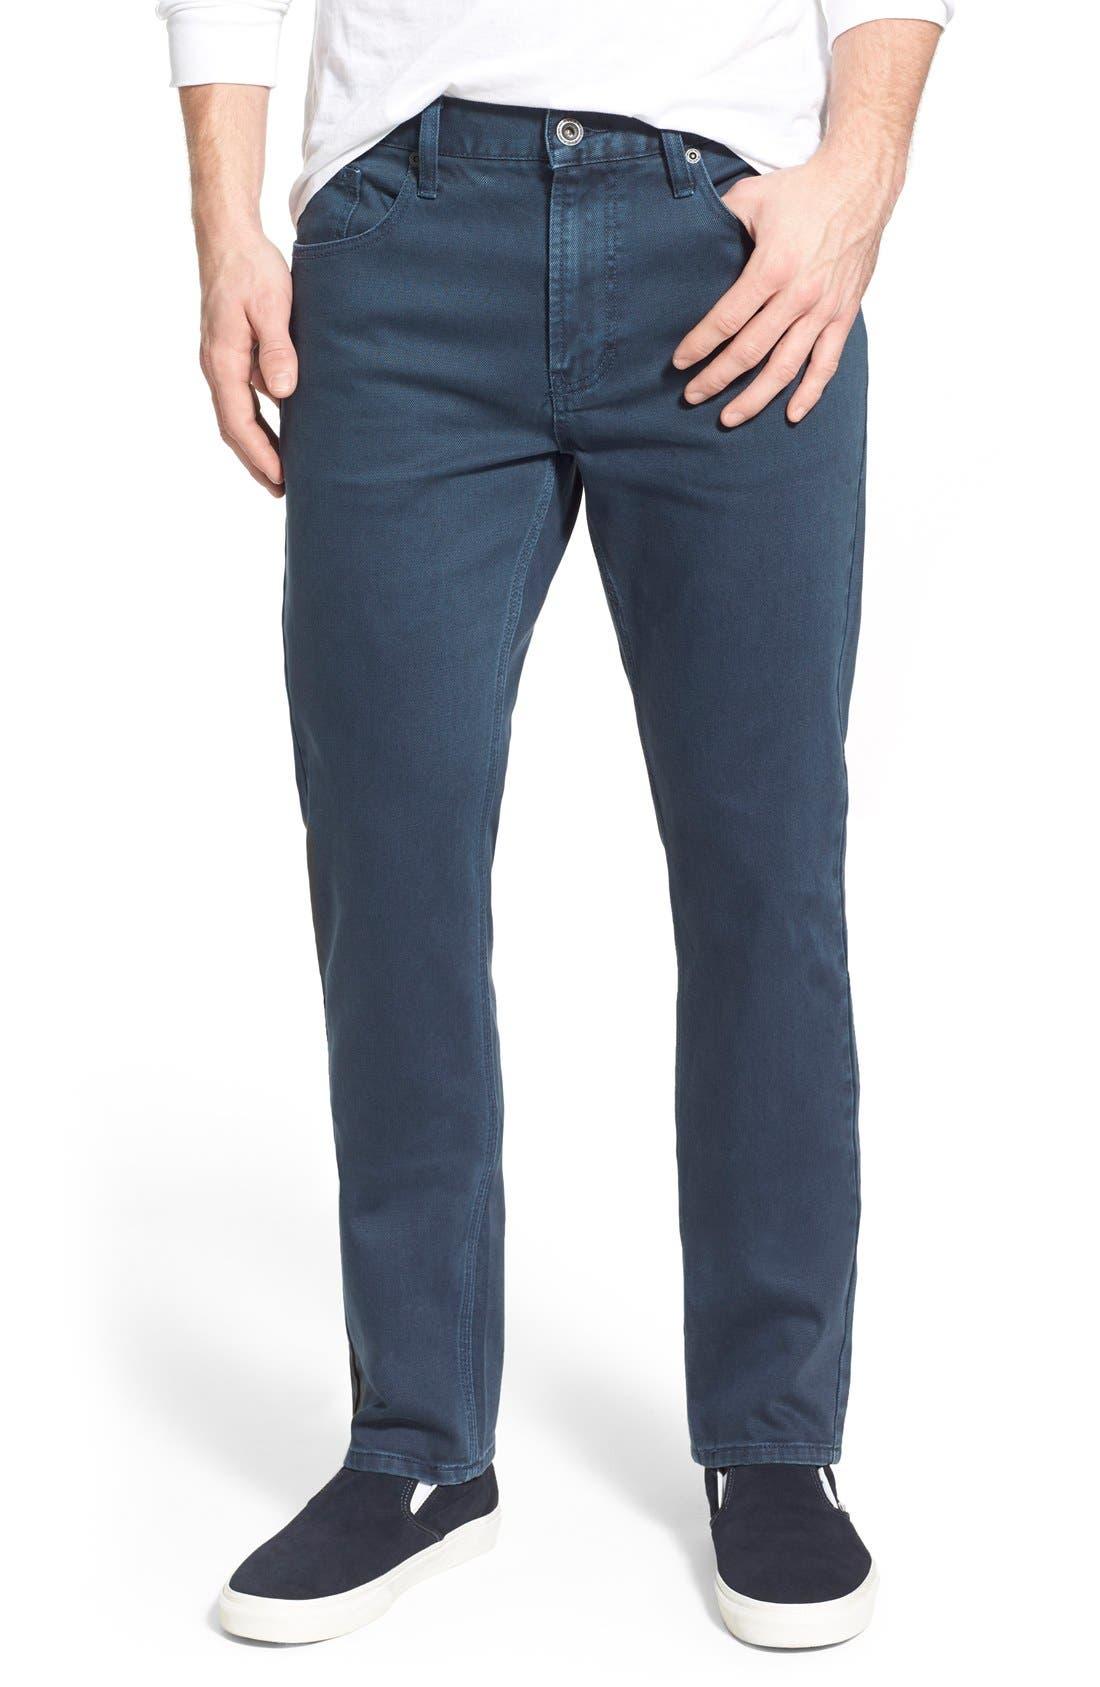 Main Image - RVCA 'Daggers' Slim Fit Jeans (Army Drab)